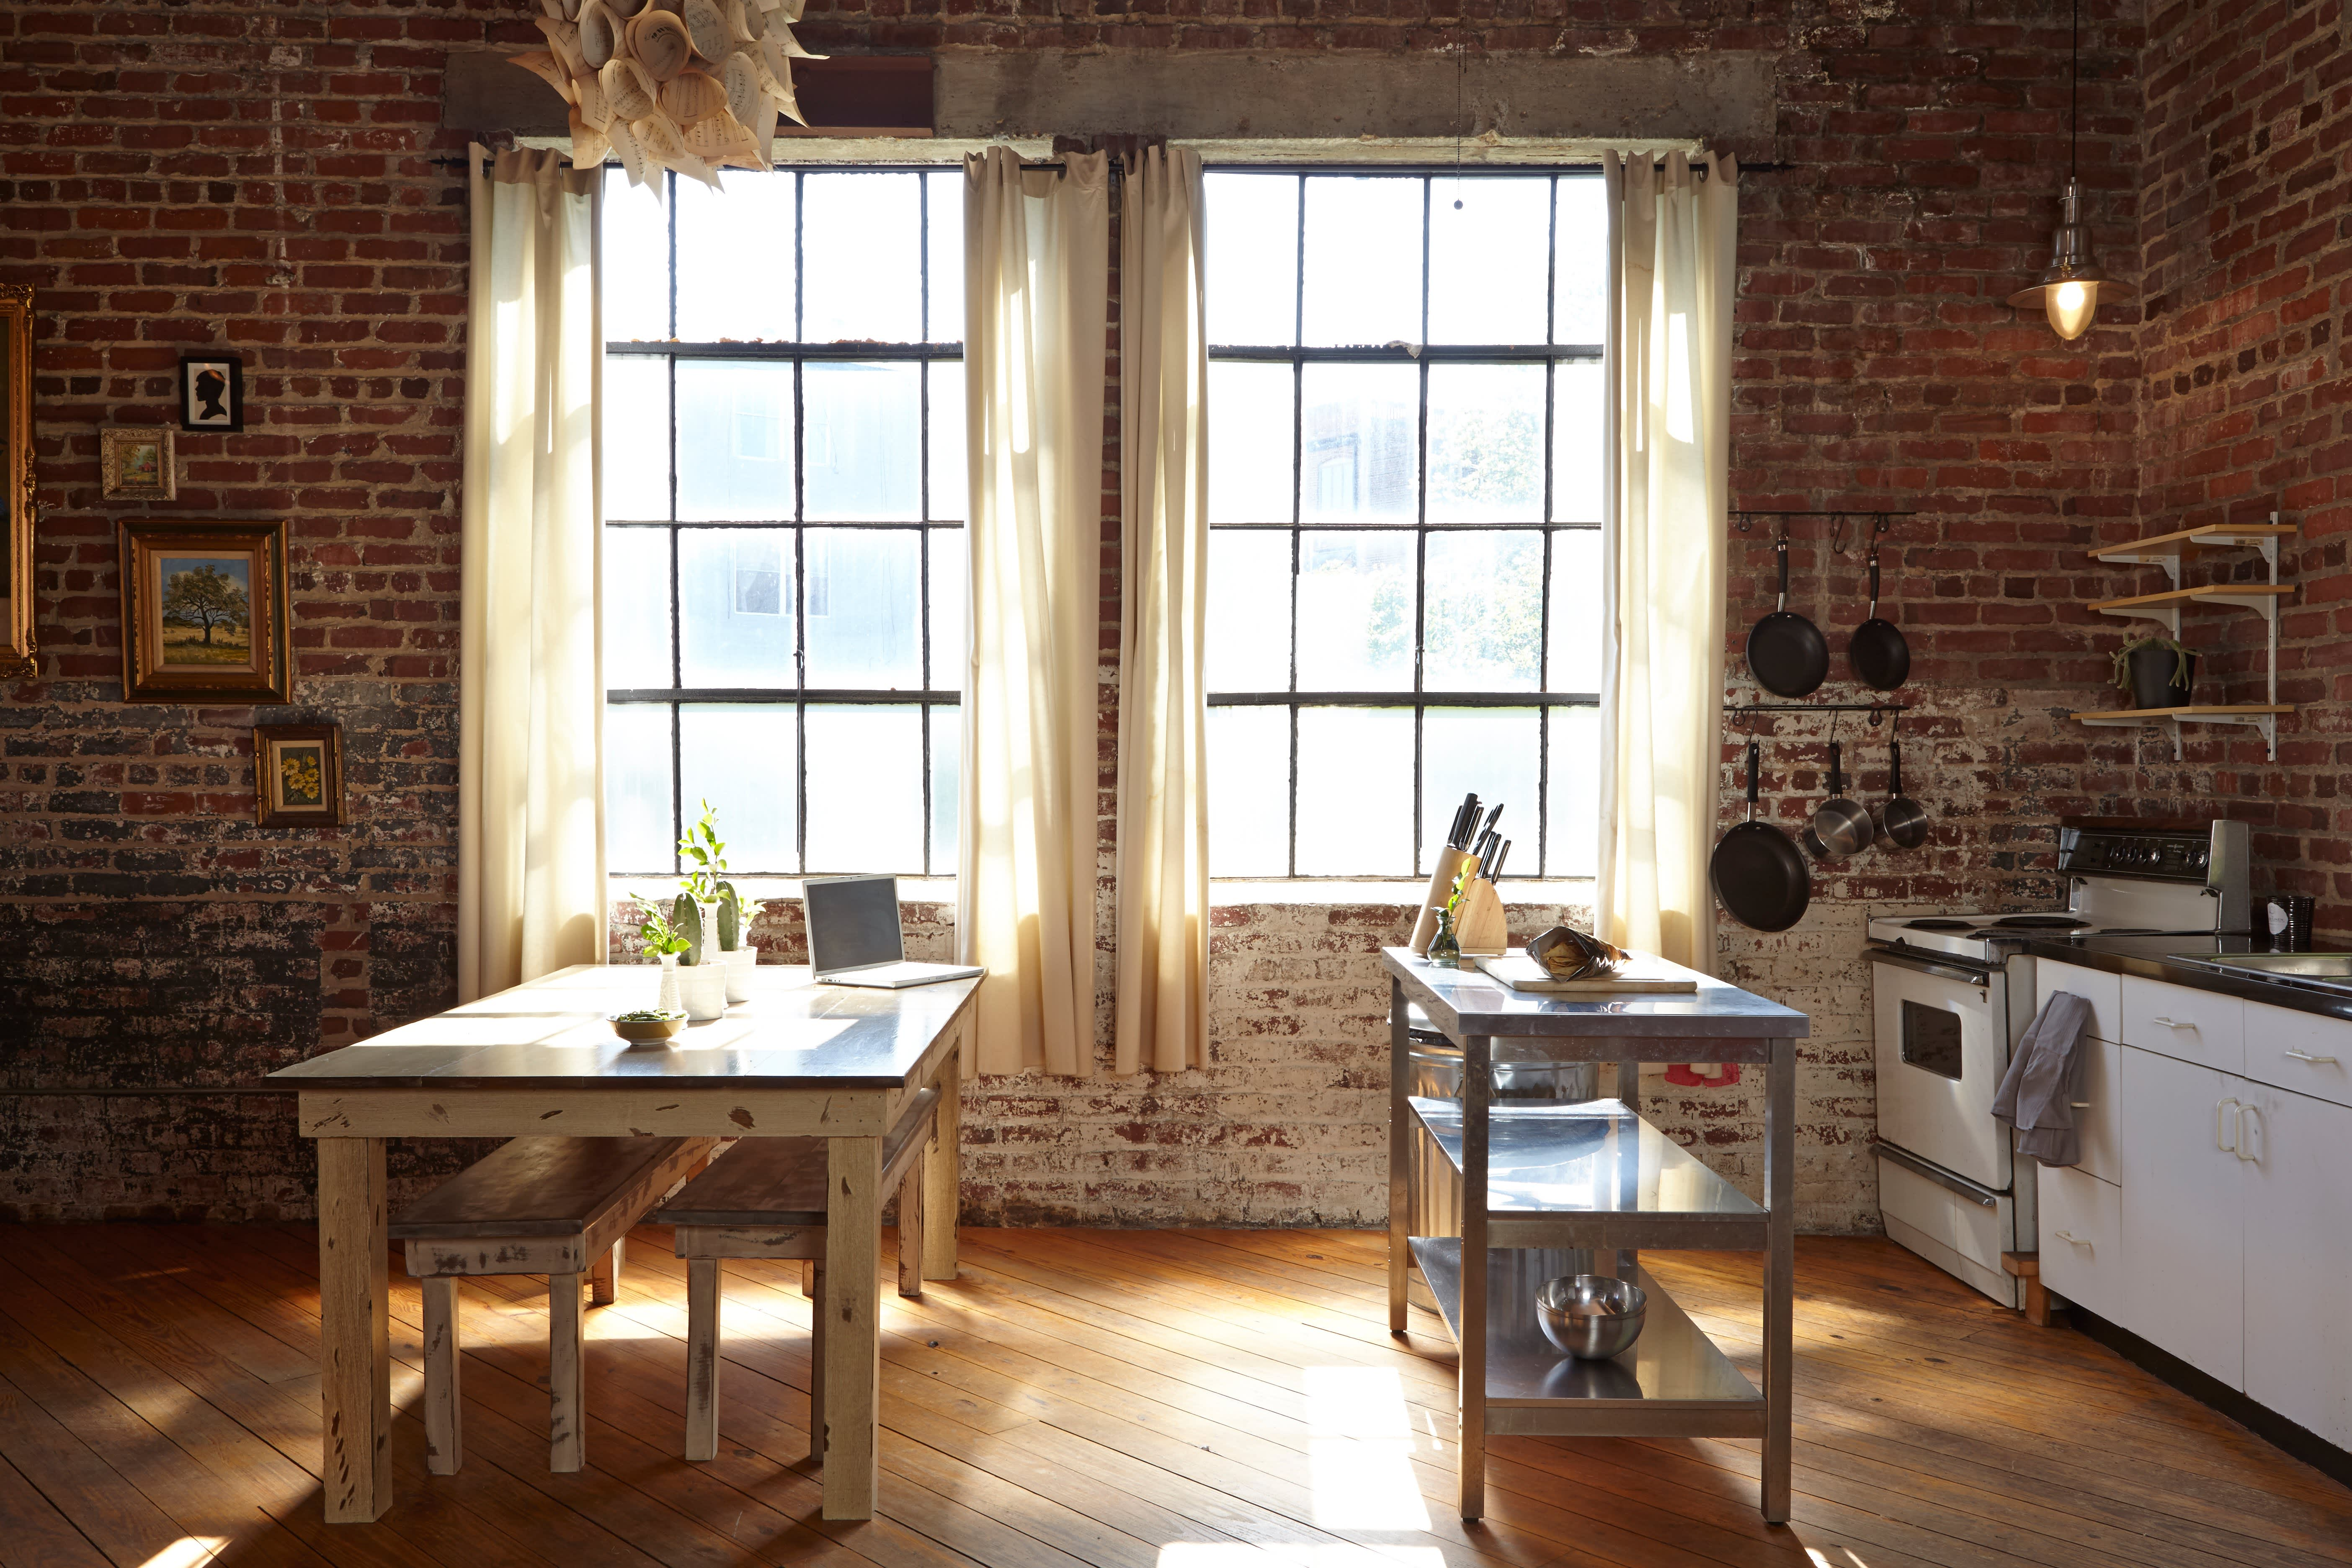 Julia's Open, Antique-Industrial Atlanta Kitchen: gallery image 14